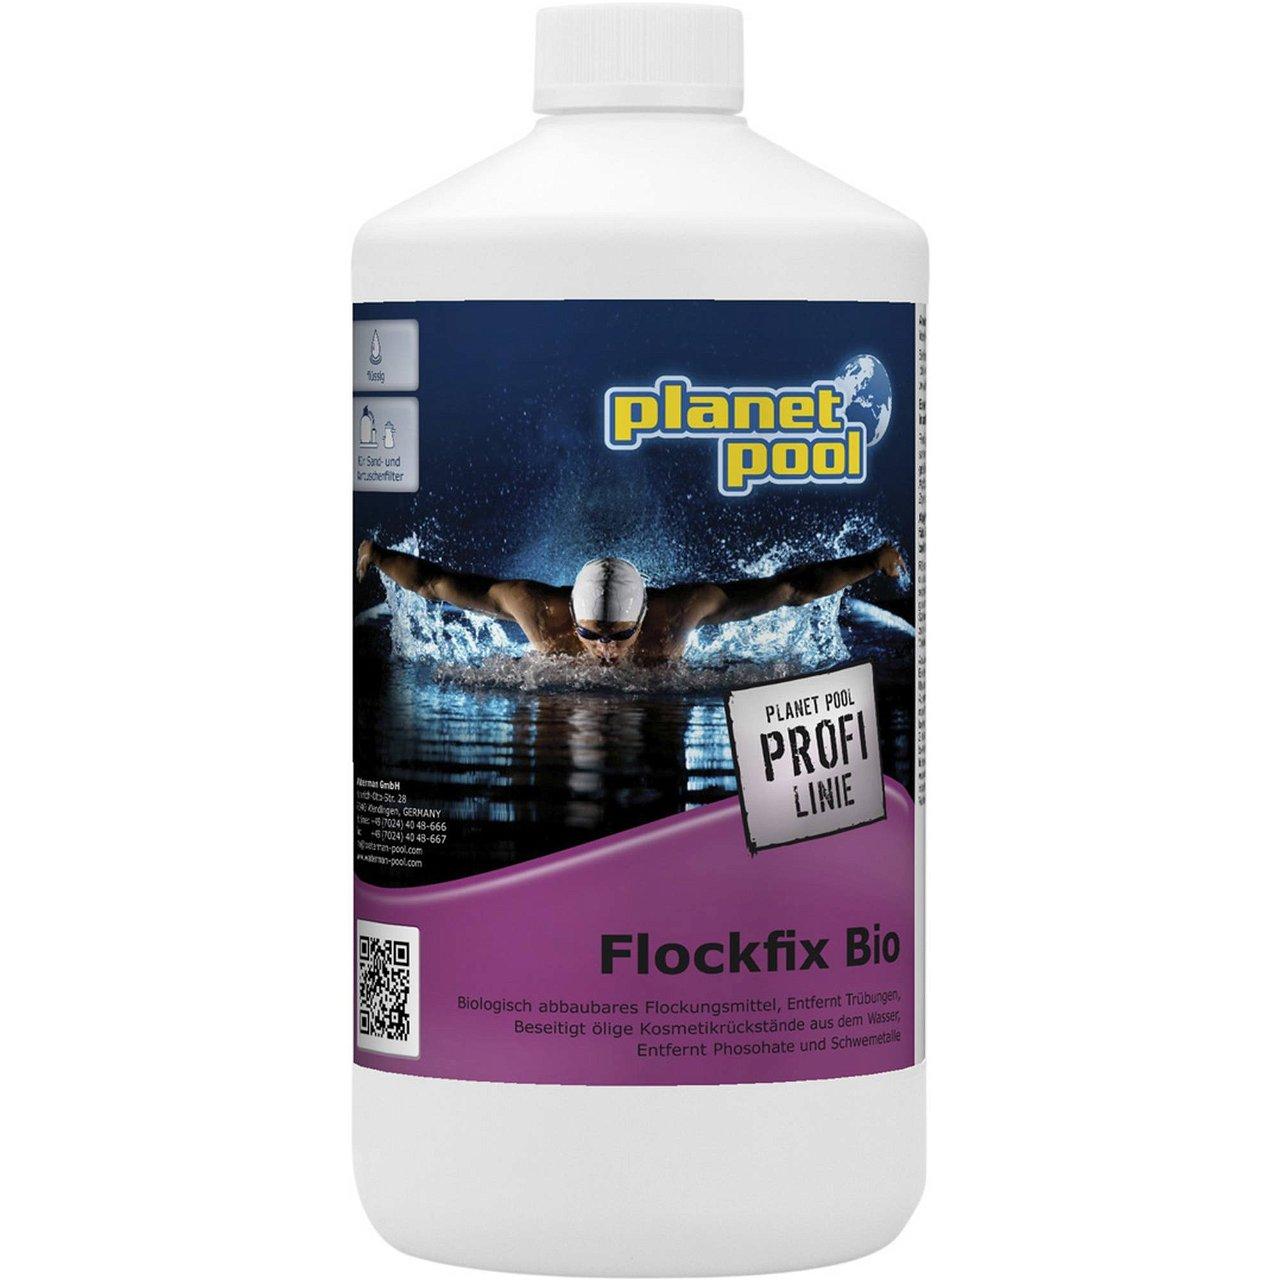 PLANET POOL - Profi Linie |  Flockfix Bio 1 Liter